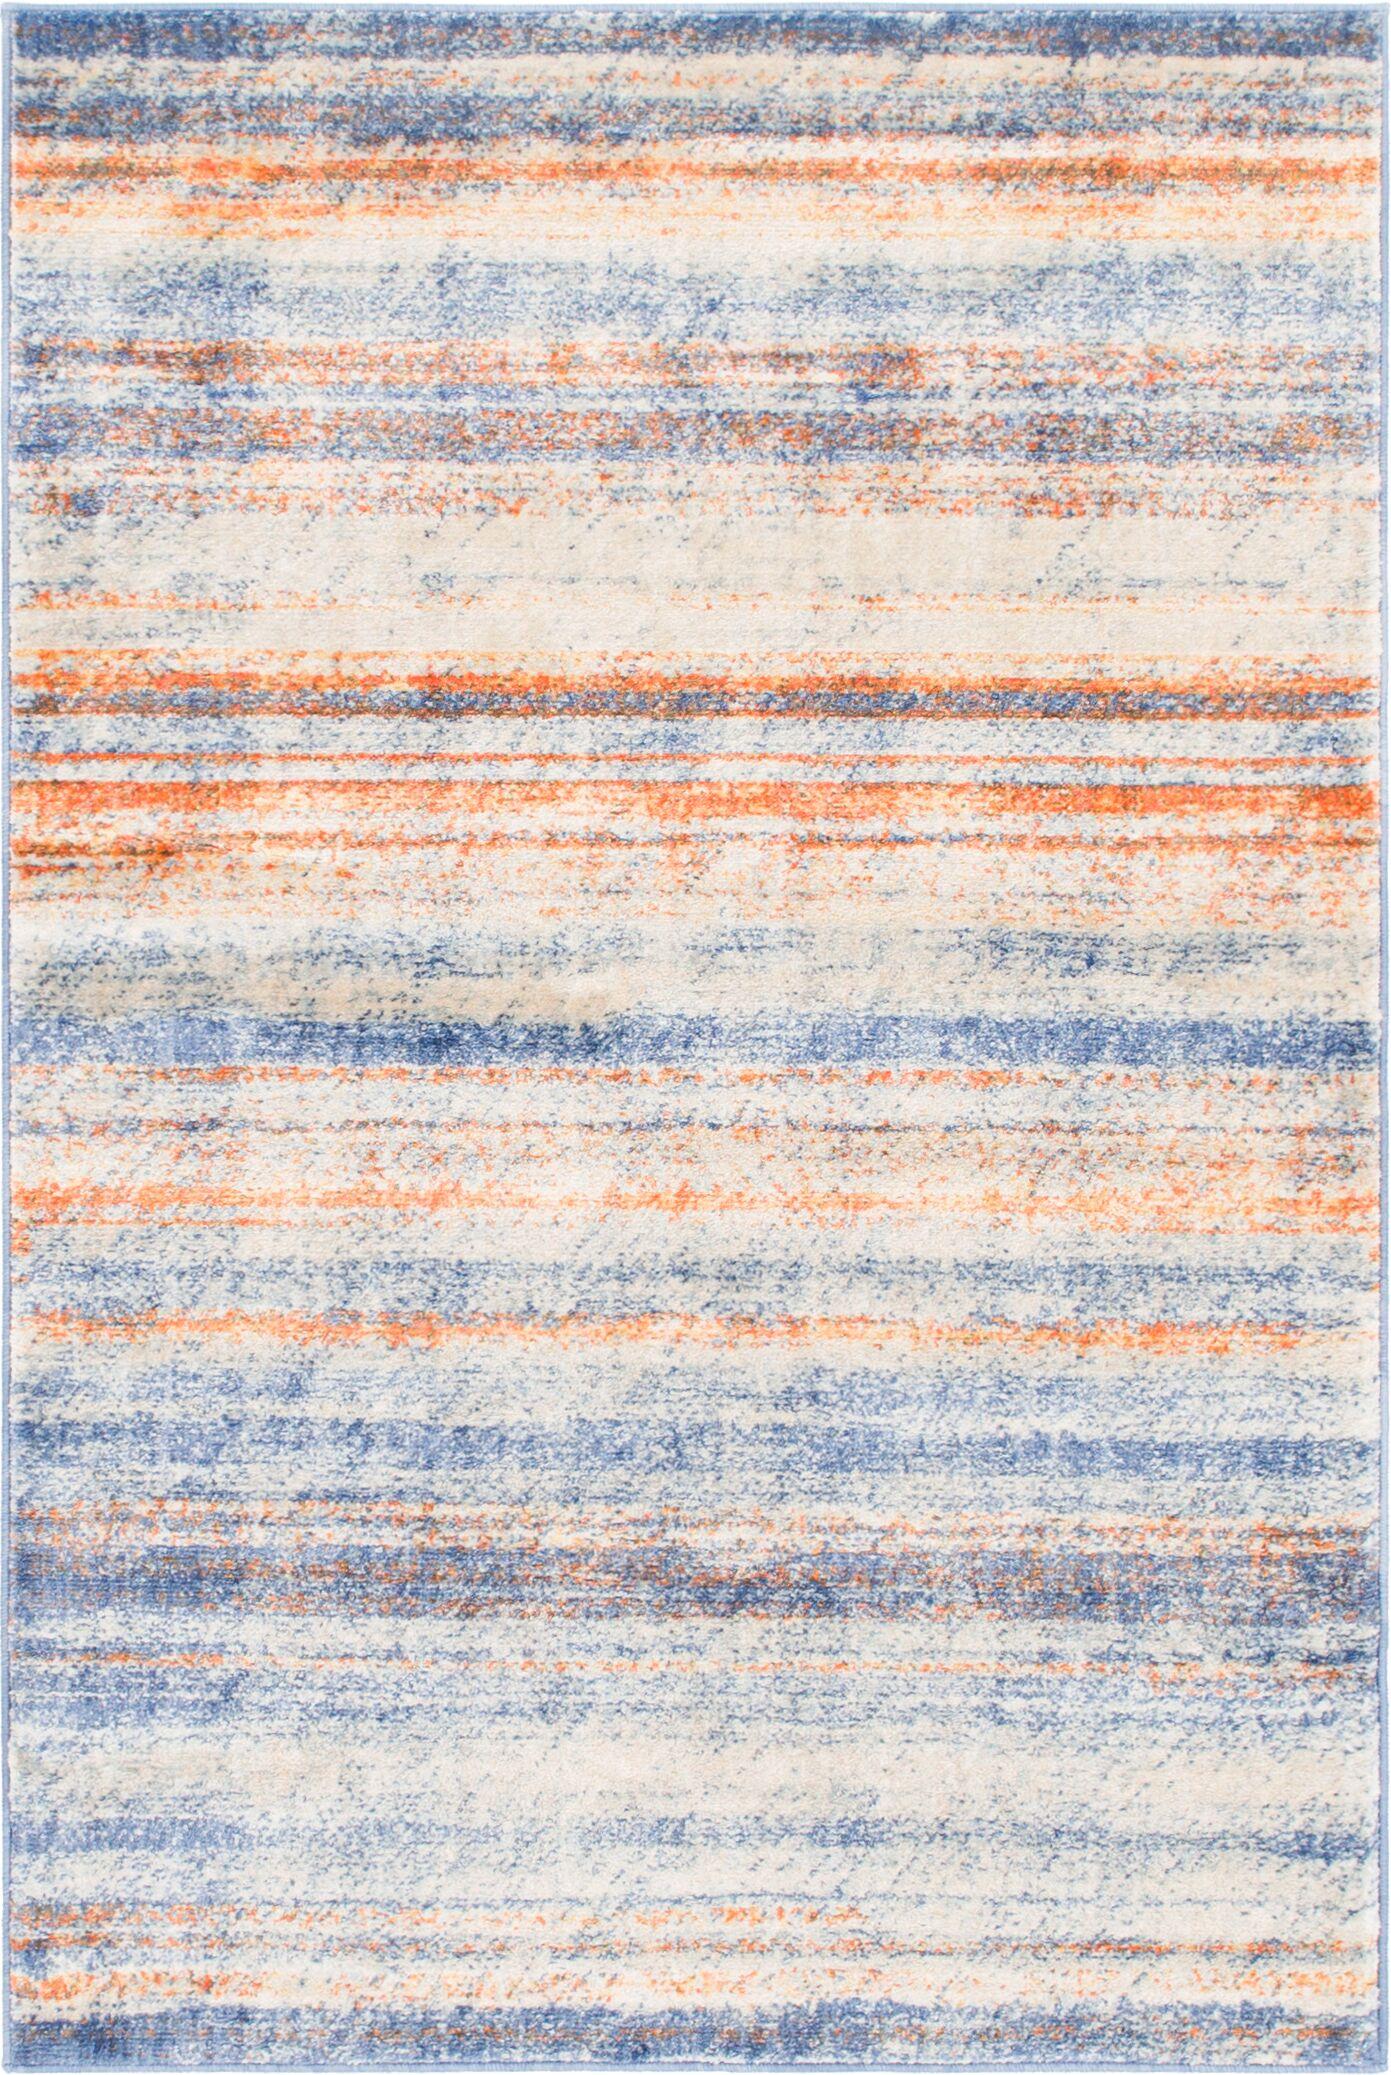 Montross Blue/Orange Area Rug Rug Size: Rectangle 4' x 6'